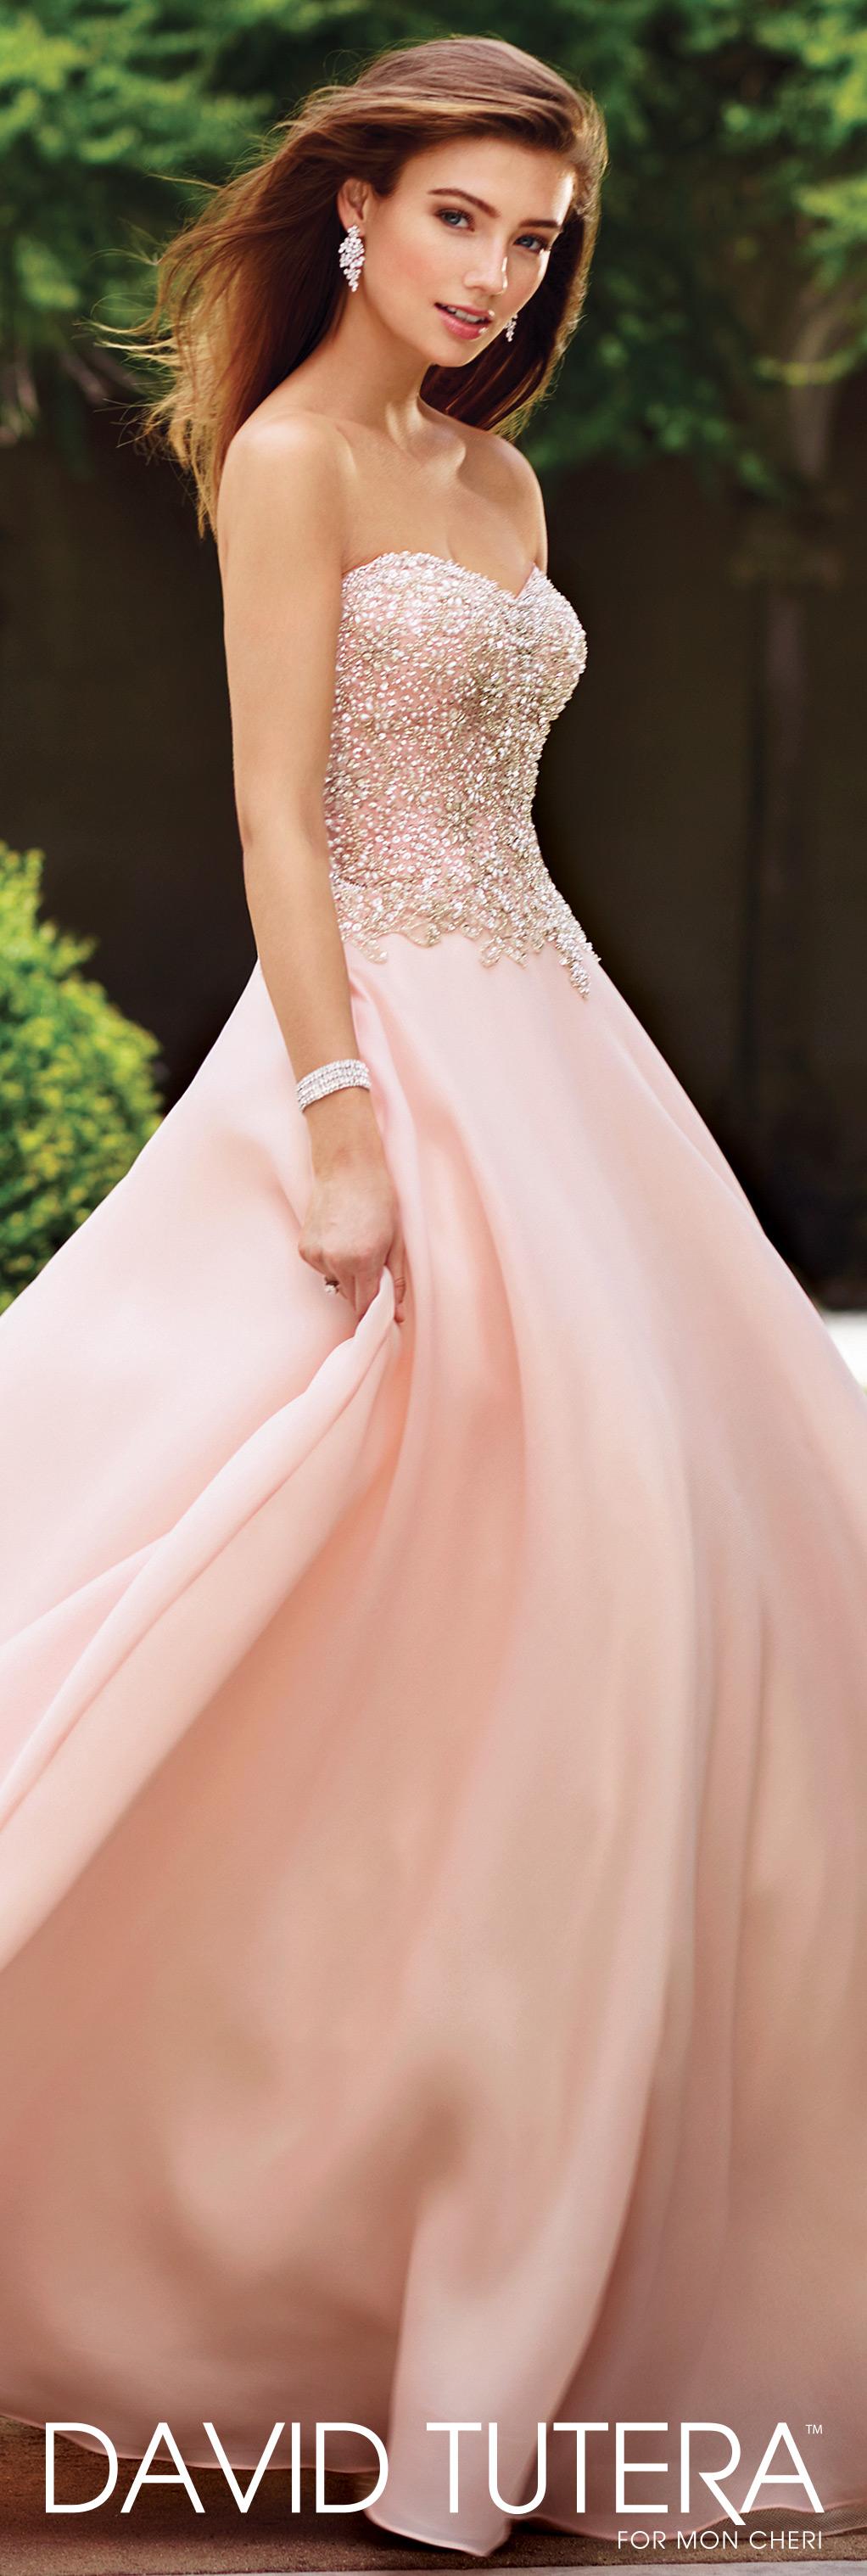 Strapless satin beaded ball gown wedding dress adelina